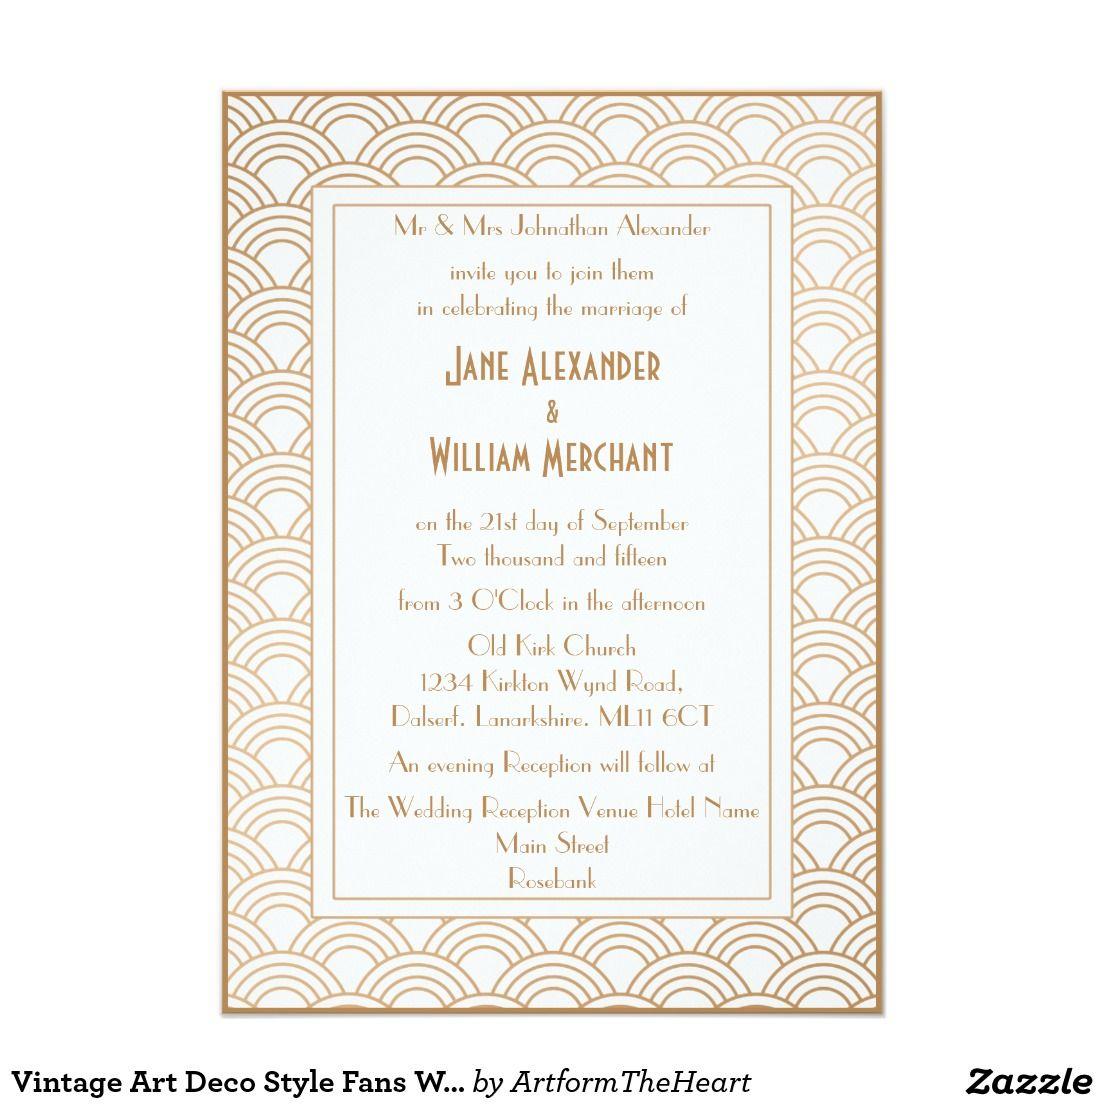 Vintage Art Deco Style Fans Wedding Invitation | Vintage Wedding ...